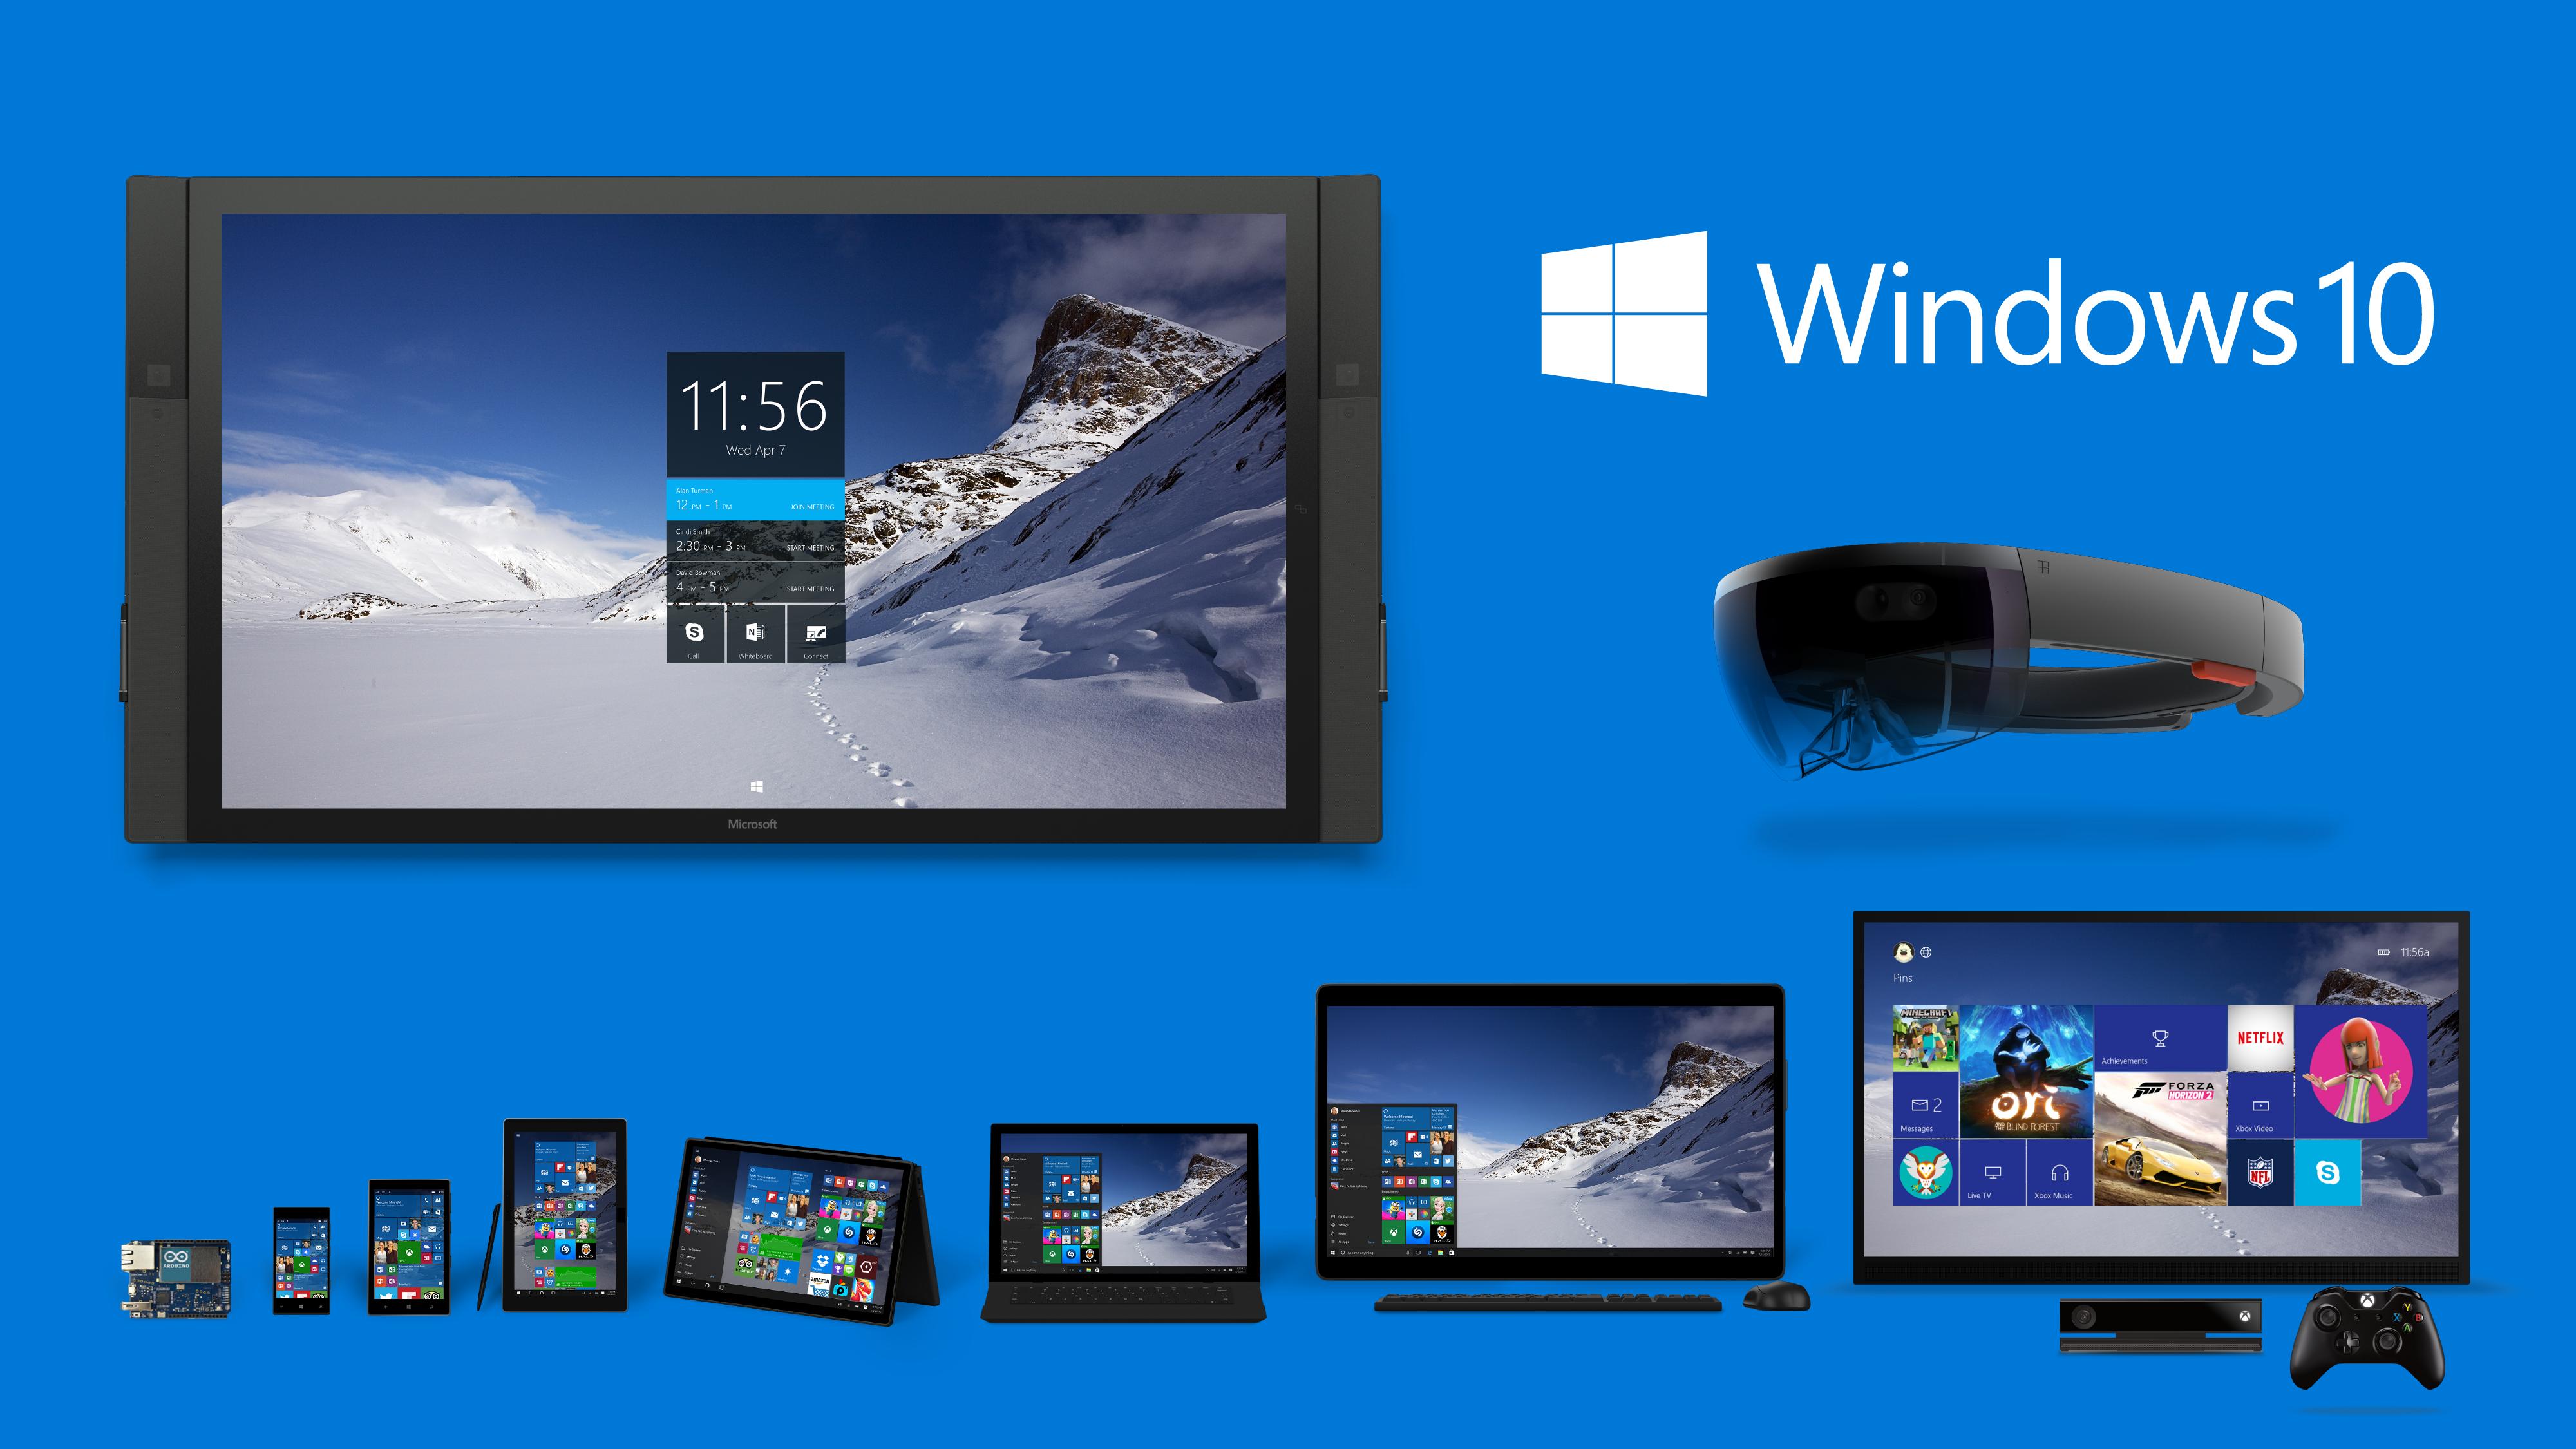 Universal Windows Platform, now down a leg - The Windows 10